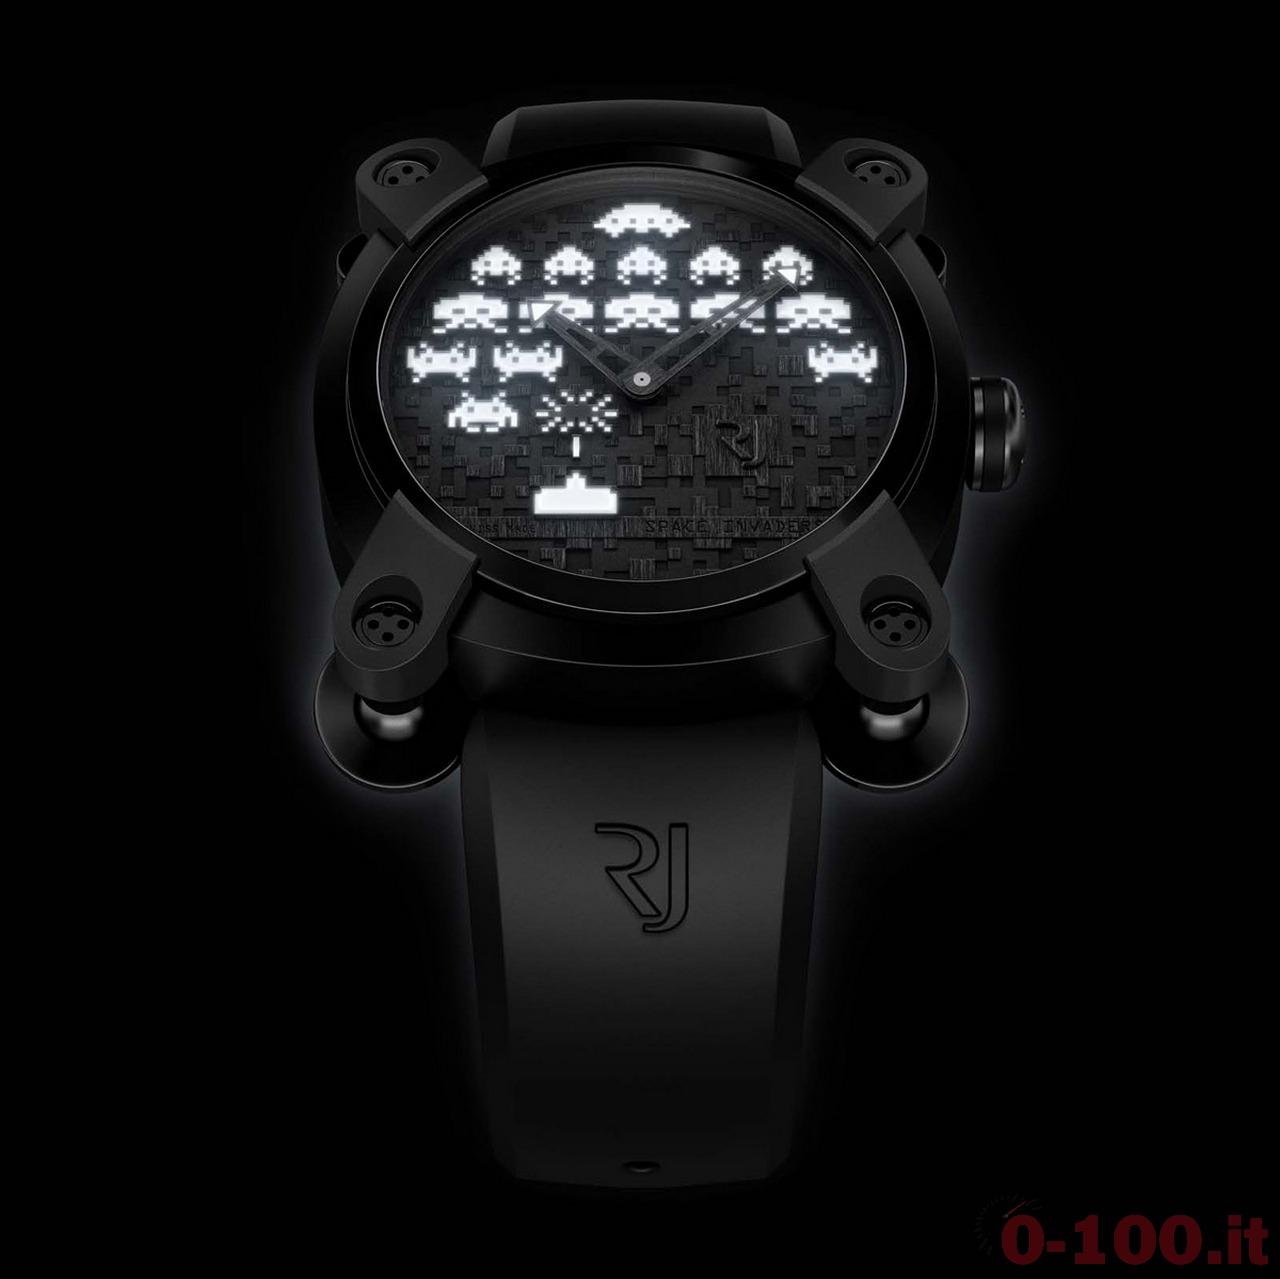 RJ-Romain Jerome Space Invaders 40 Next level Limited Edition Ref. RJ.M.AU.IN.021.02, Ref. RJ.M.AU.IN.021.01 prezzo price-0-100_2